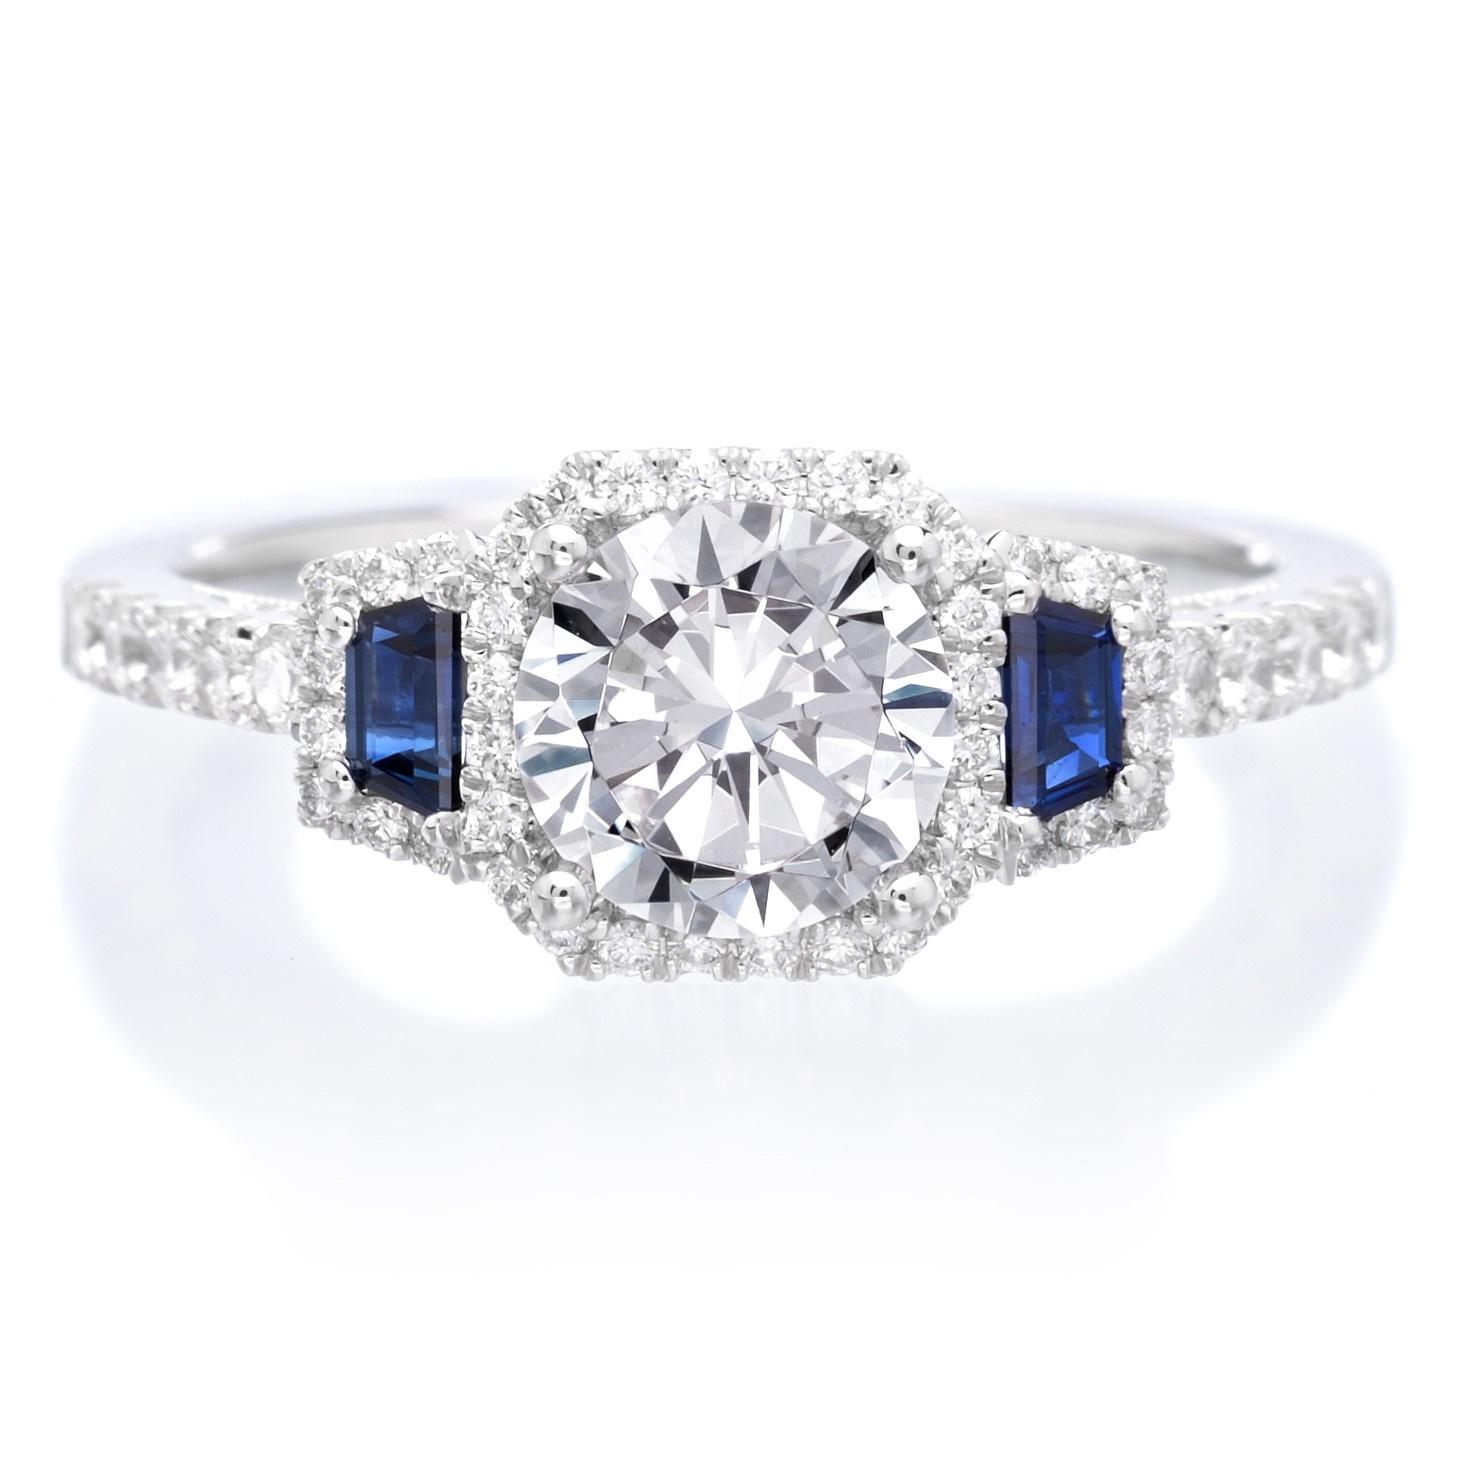 18K White Gold Three-Stone Diamond and Blue Sapphire Engagement Ring